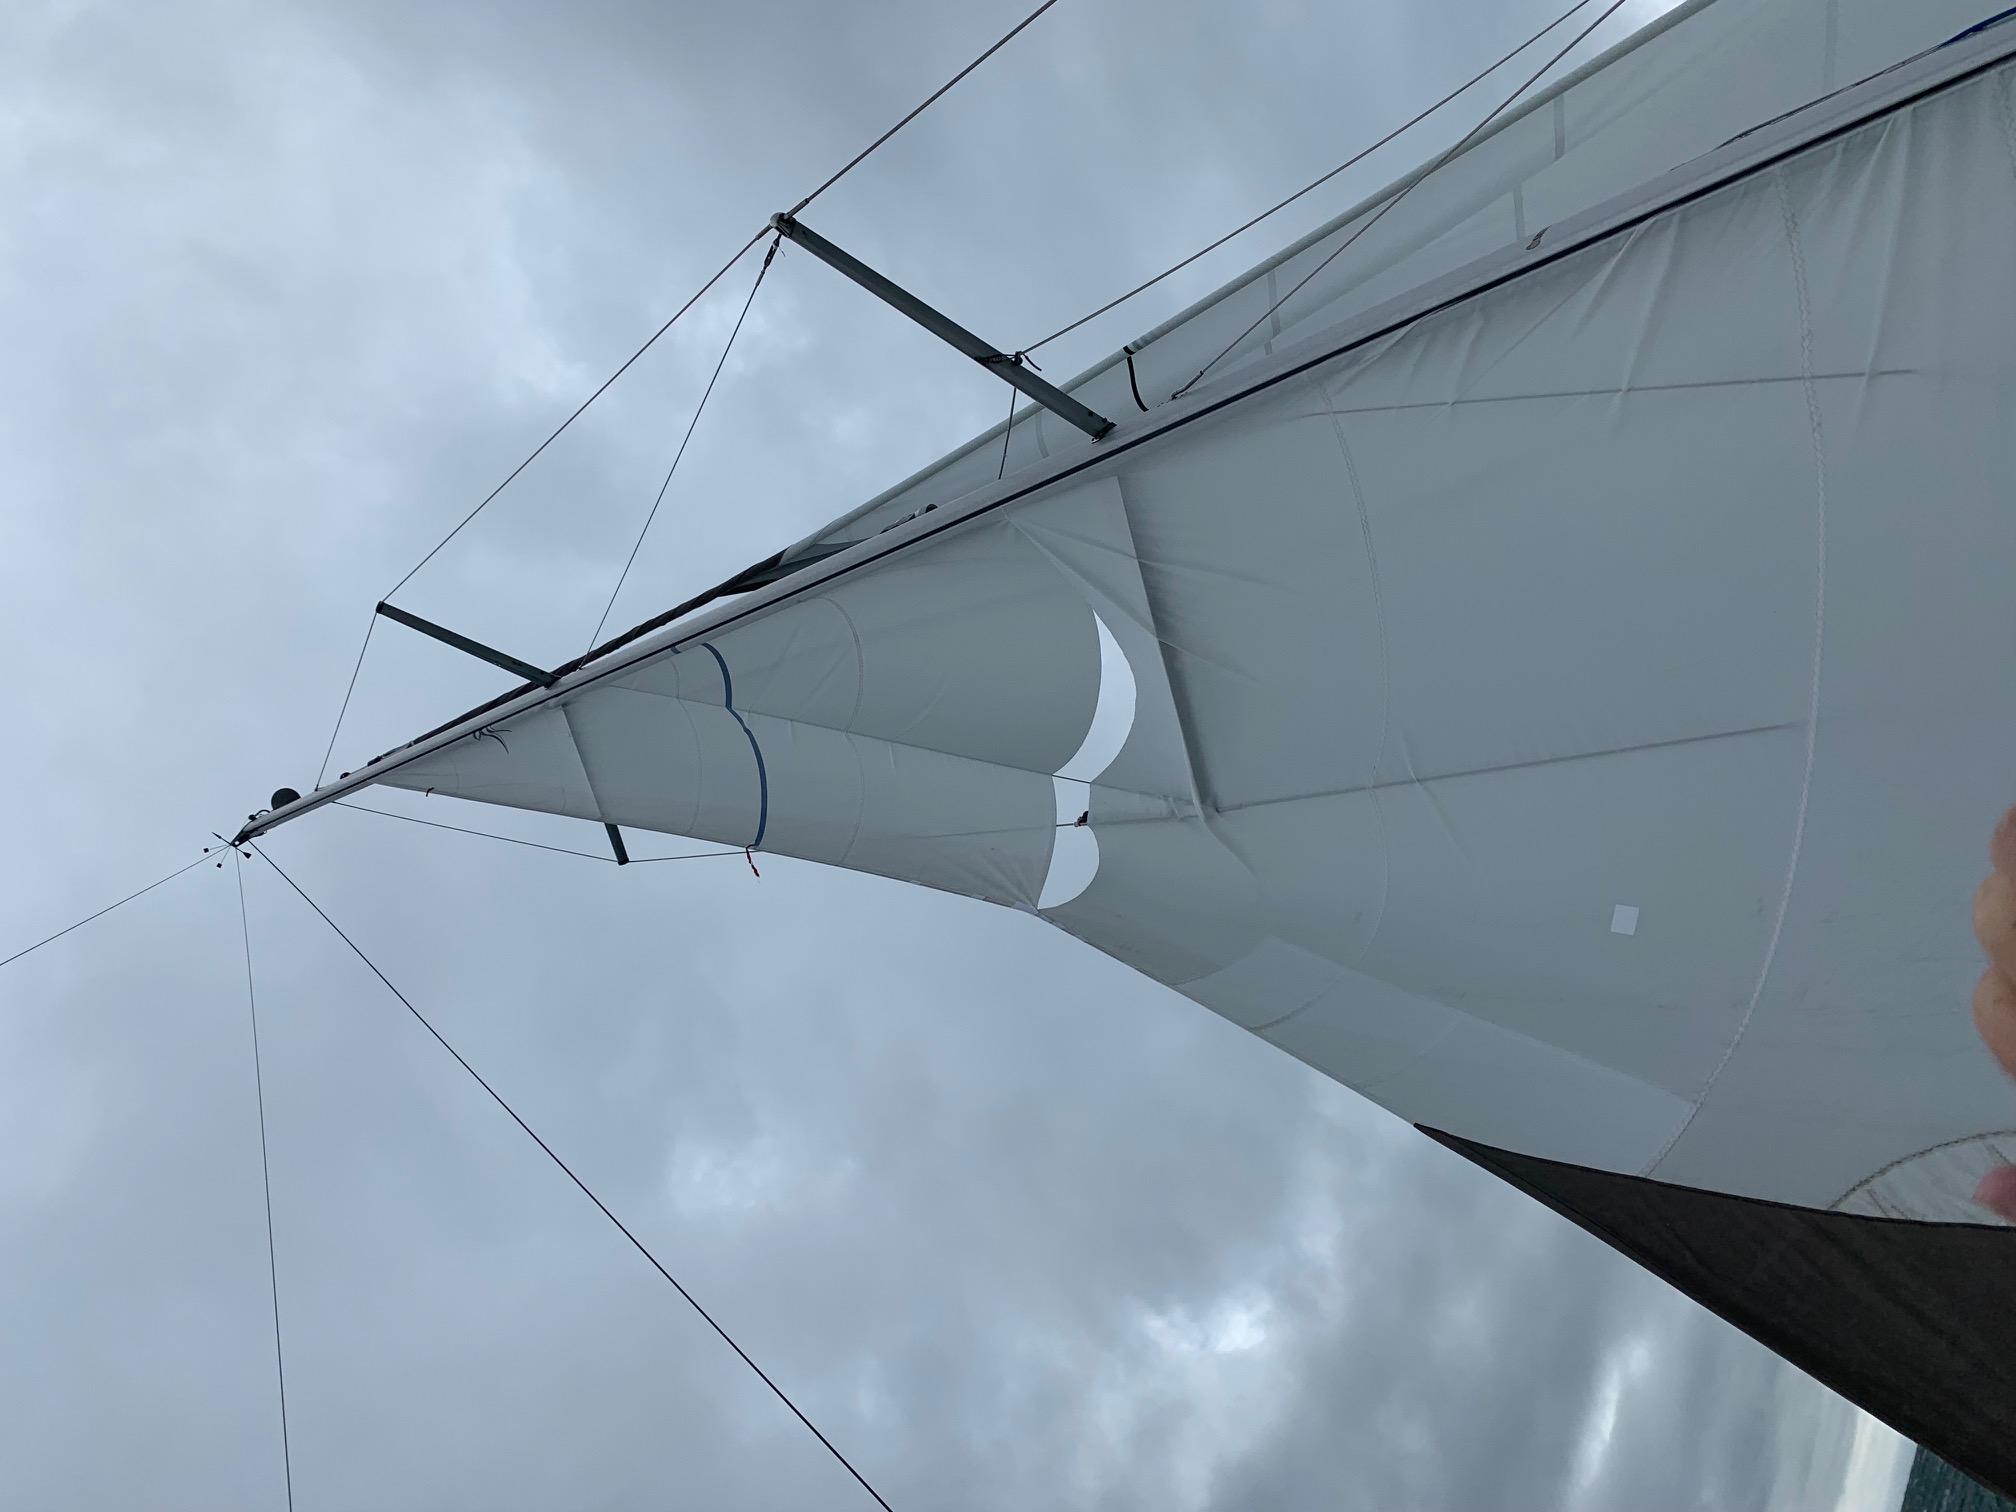 Jeanneau 379 Sun Odyssey Sailboat blown mainsail